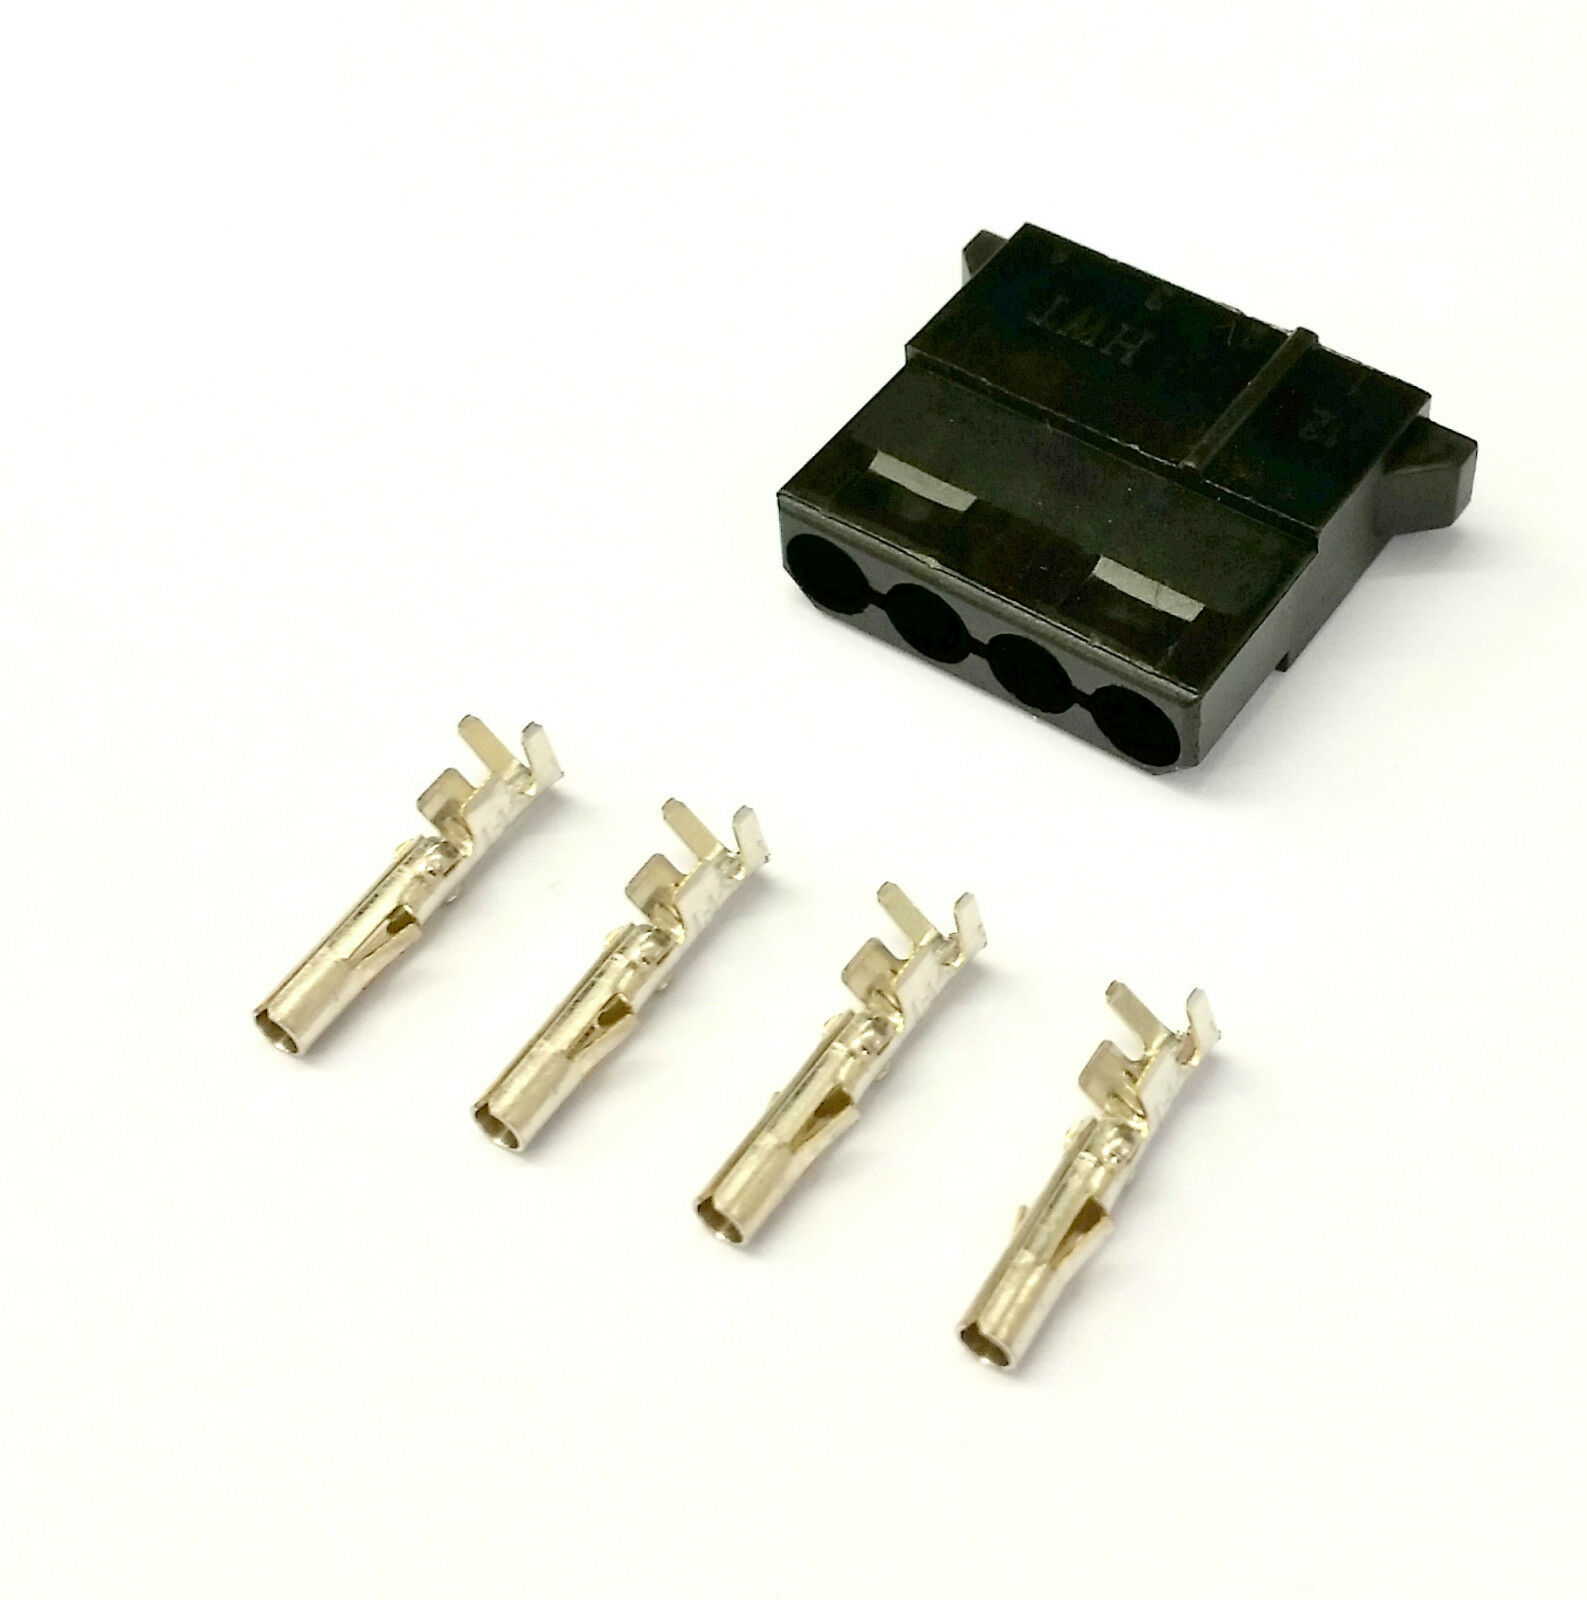 MALE & FEMALE 4 Pin Molex Pc Psu Power Connectors - 1 Of Each- Black ...